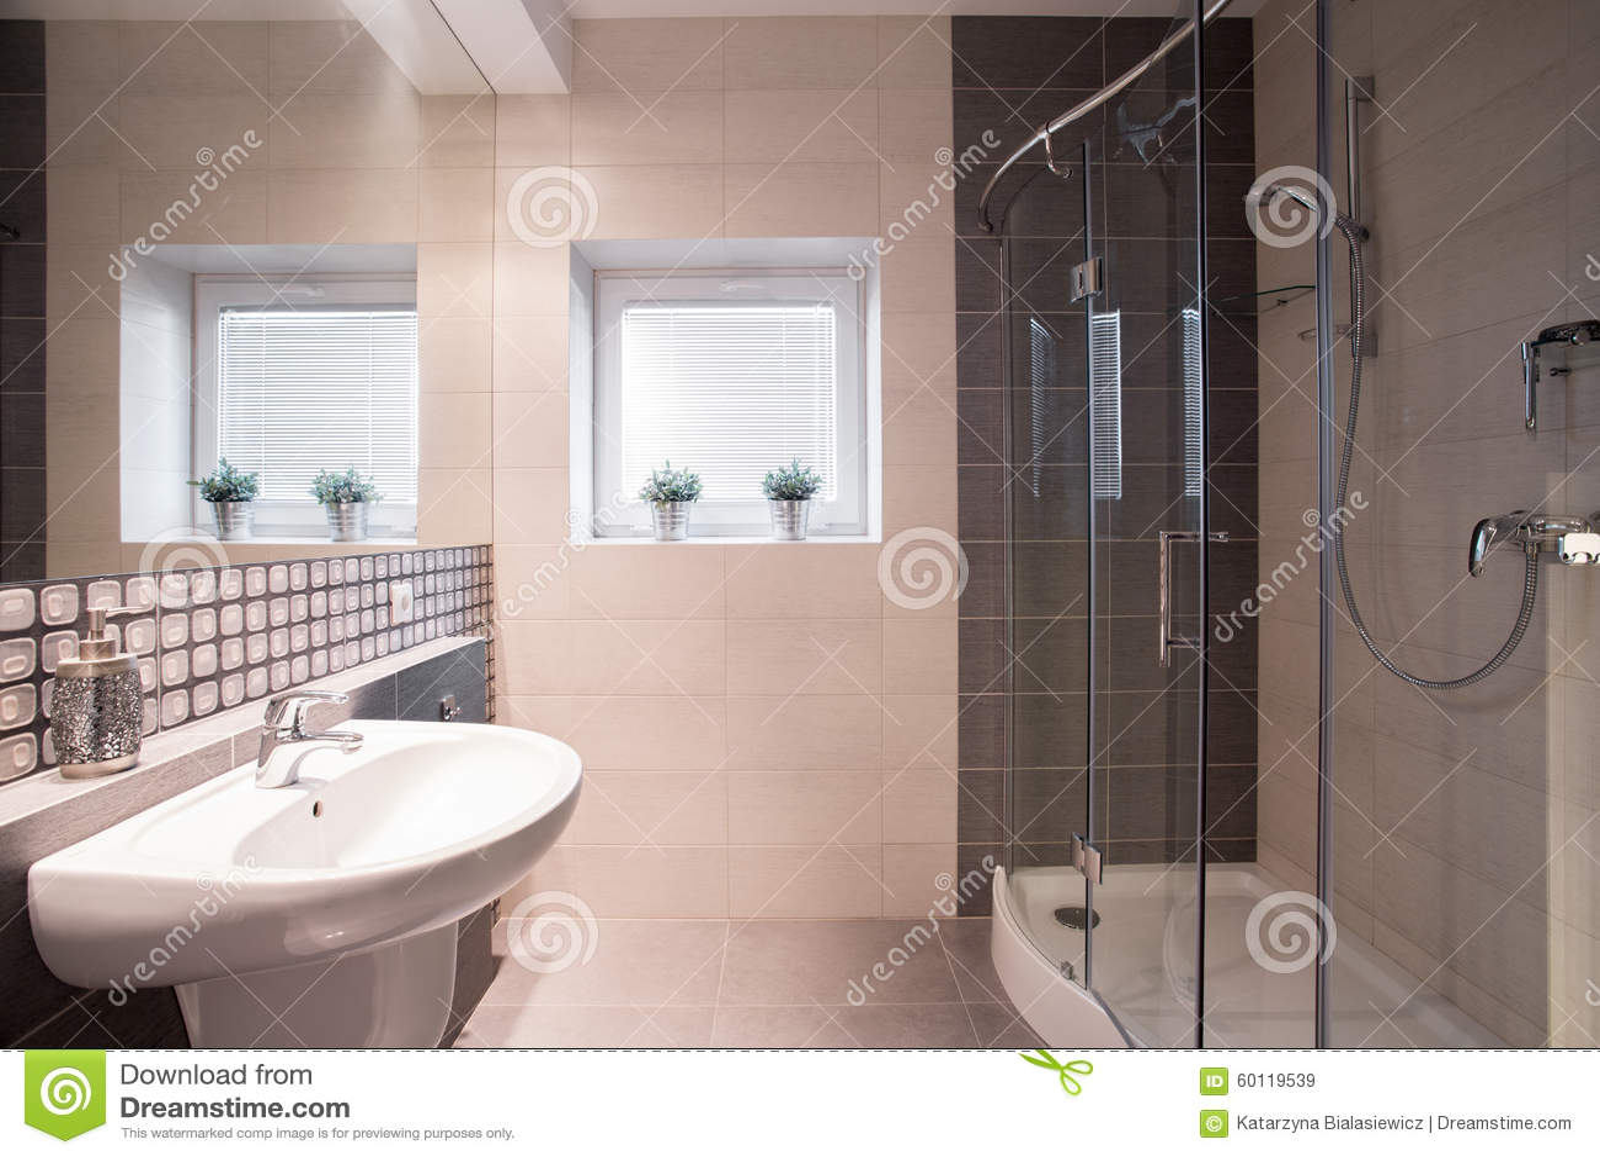 Fancy Bathroom With Big Shower Stock Image